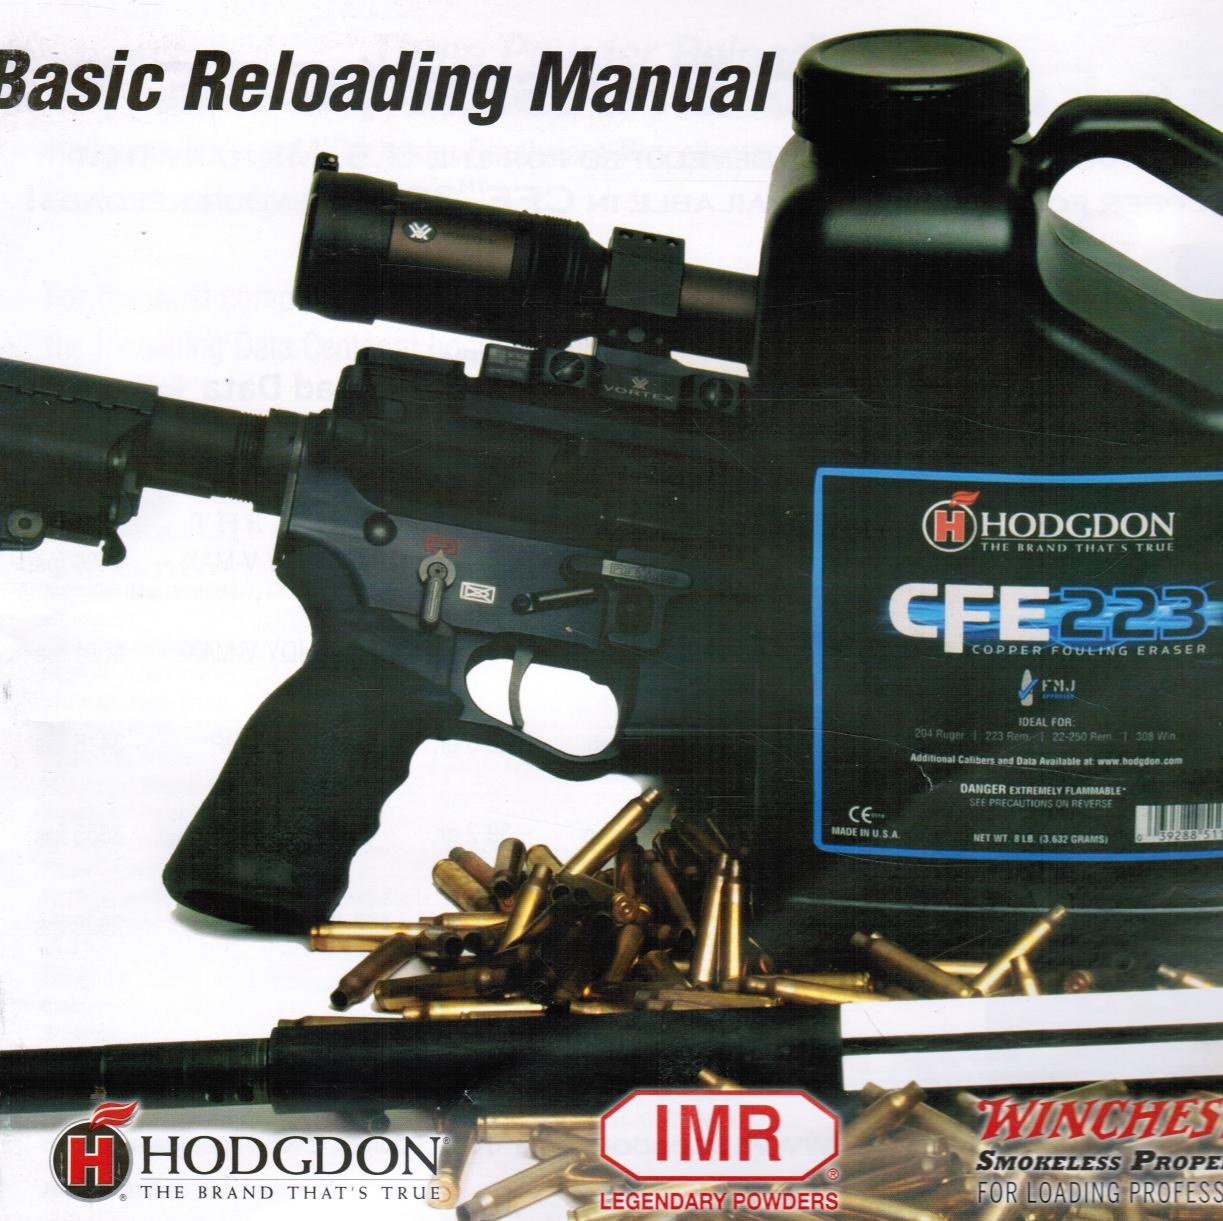 Hodgdon Basic Reloading Manual